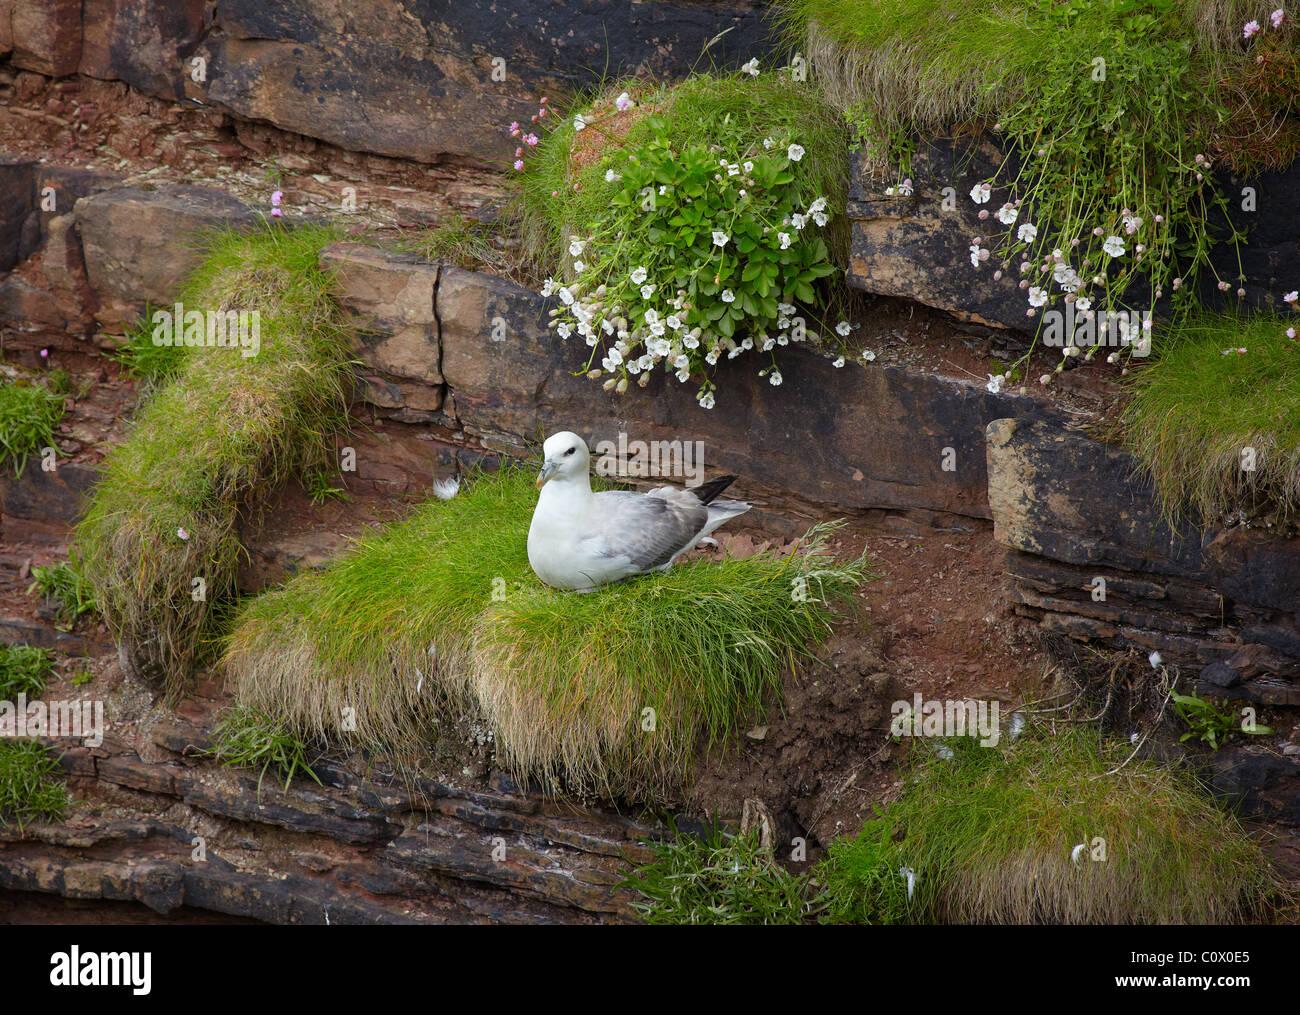 Birds rookery - Stock Image